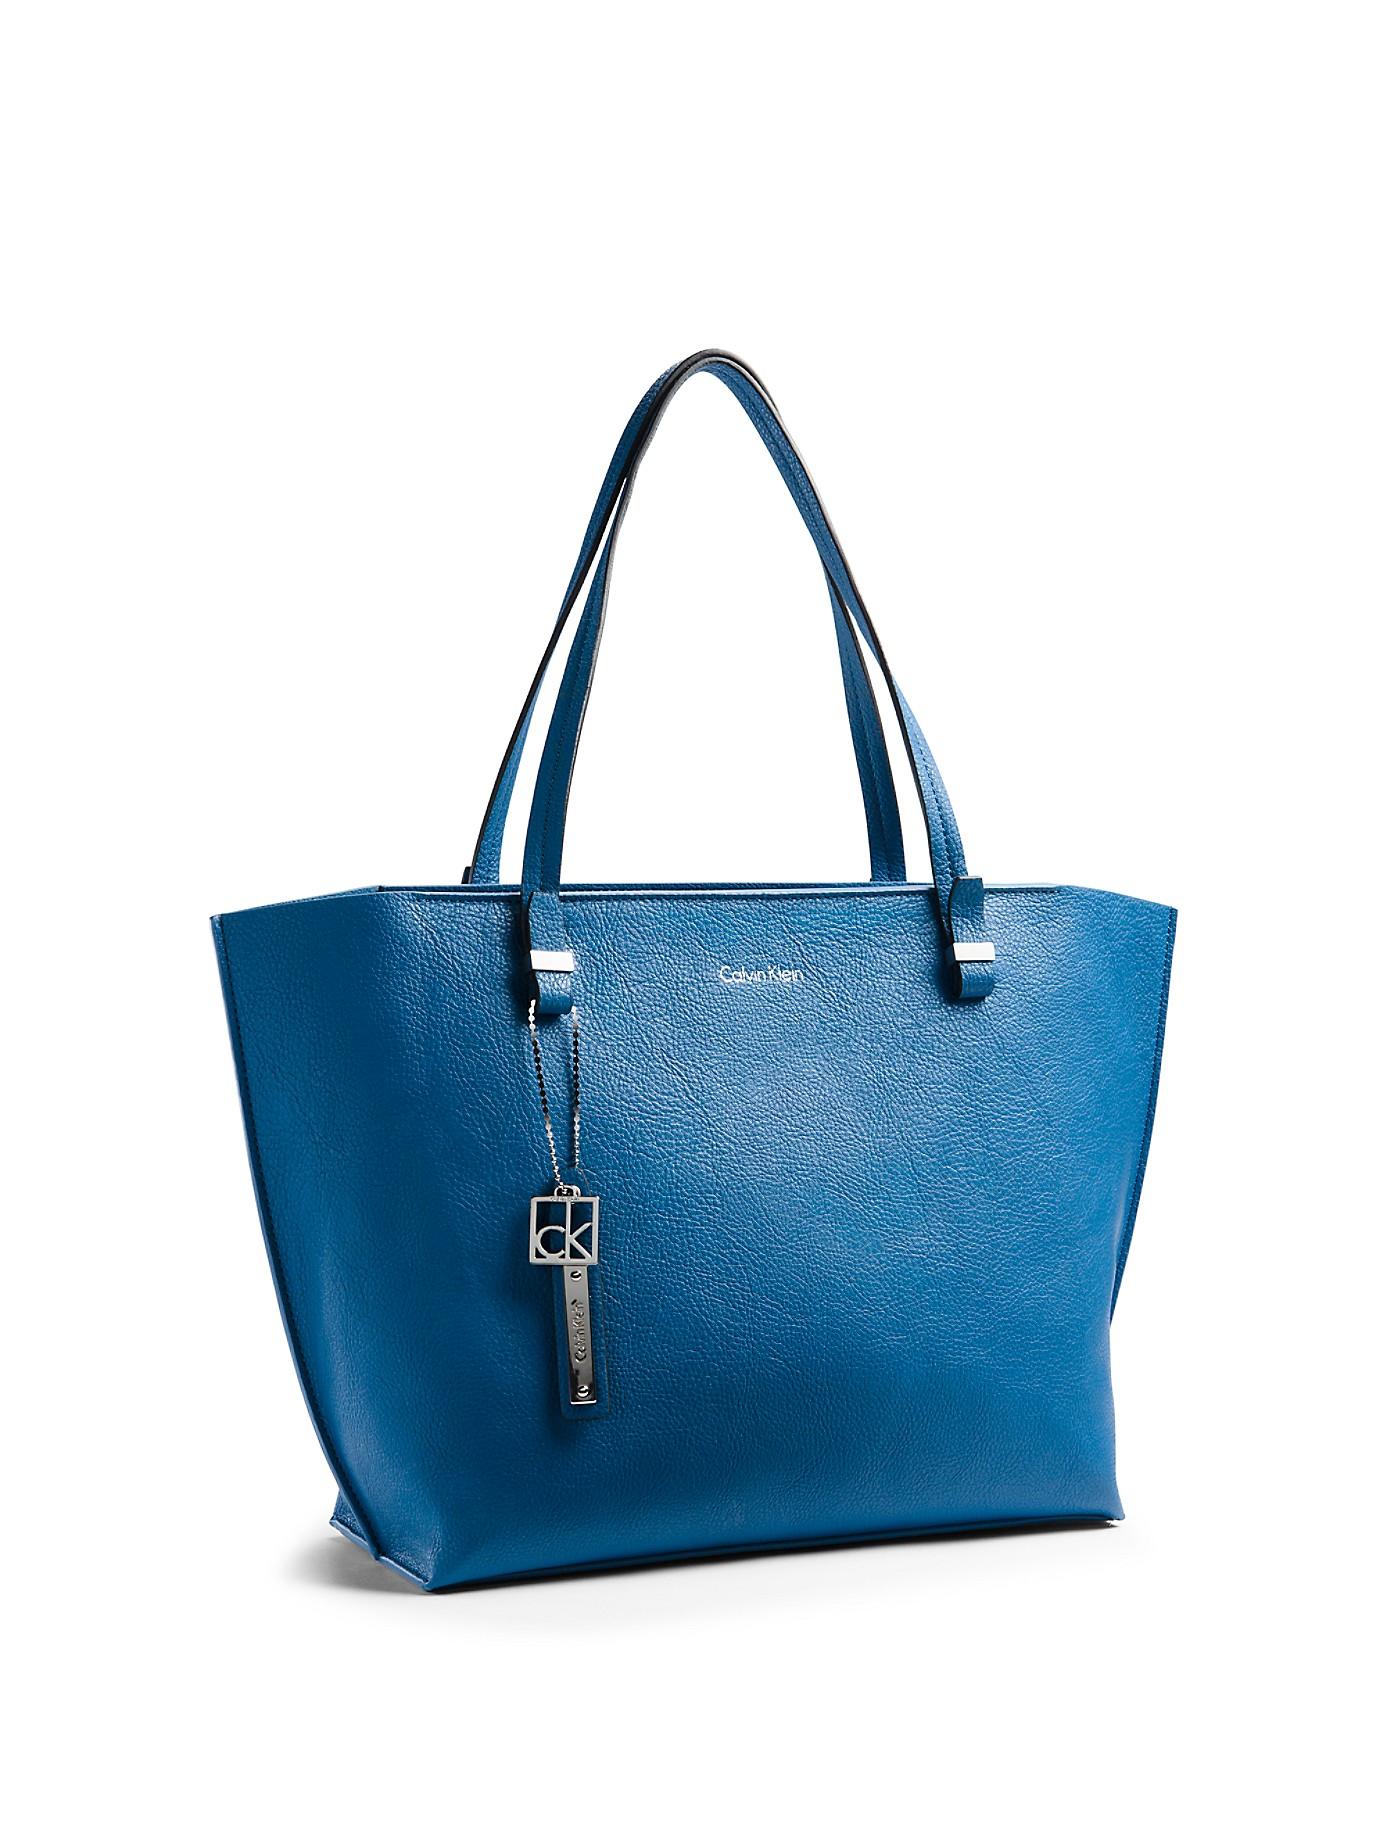 calvin klein white label hailey city shopper tote in blue. Black Bedroom Furniture Sets. Home Design Ideas